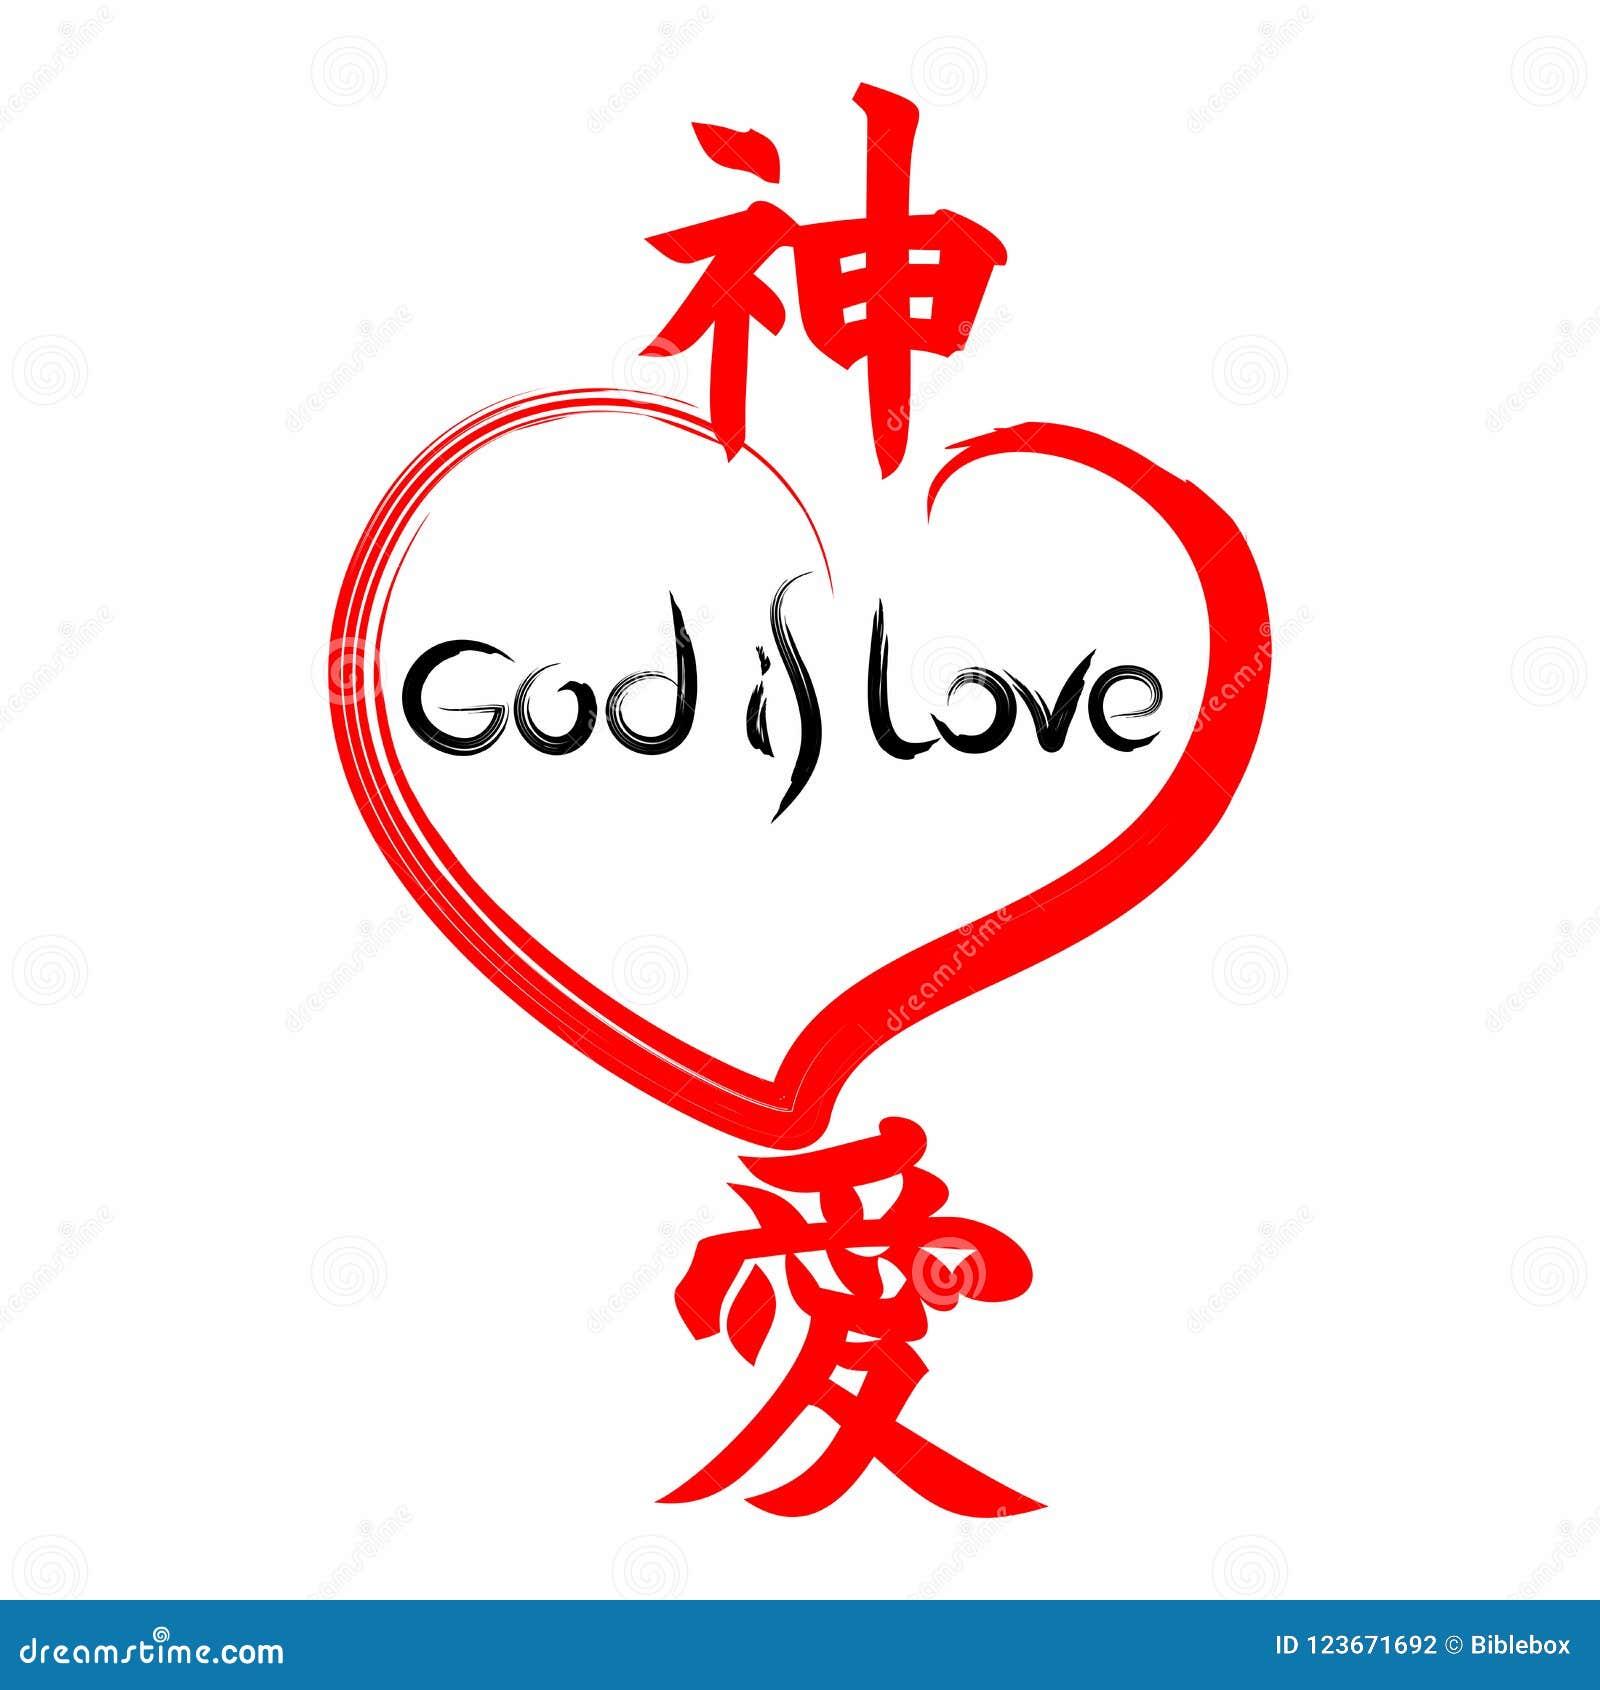 God Is Love Gospel In Japanese Kanji Stock Vector Illustration